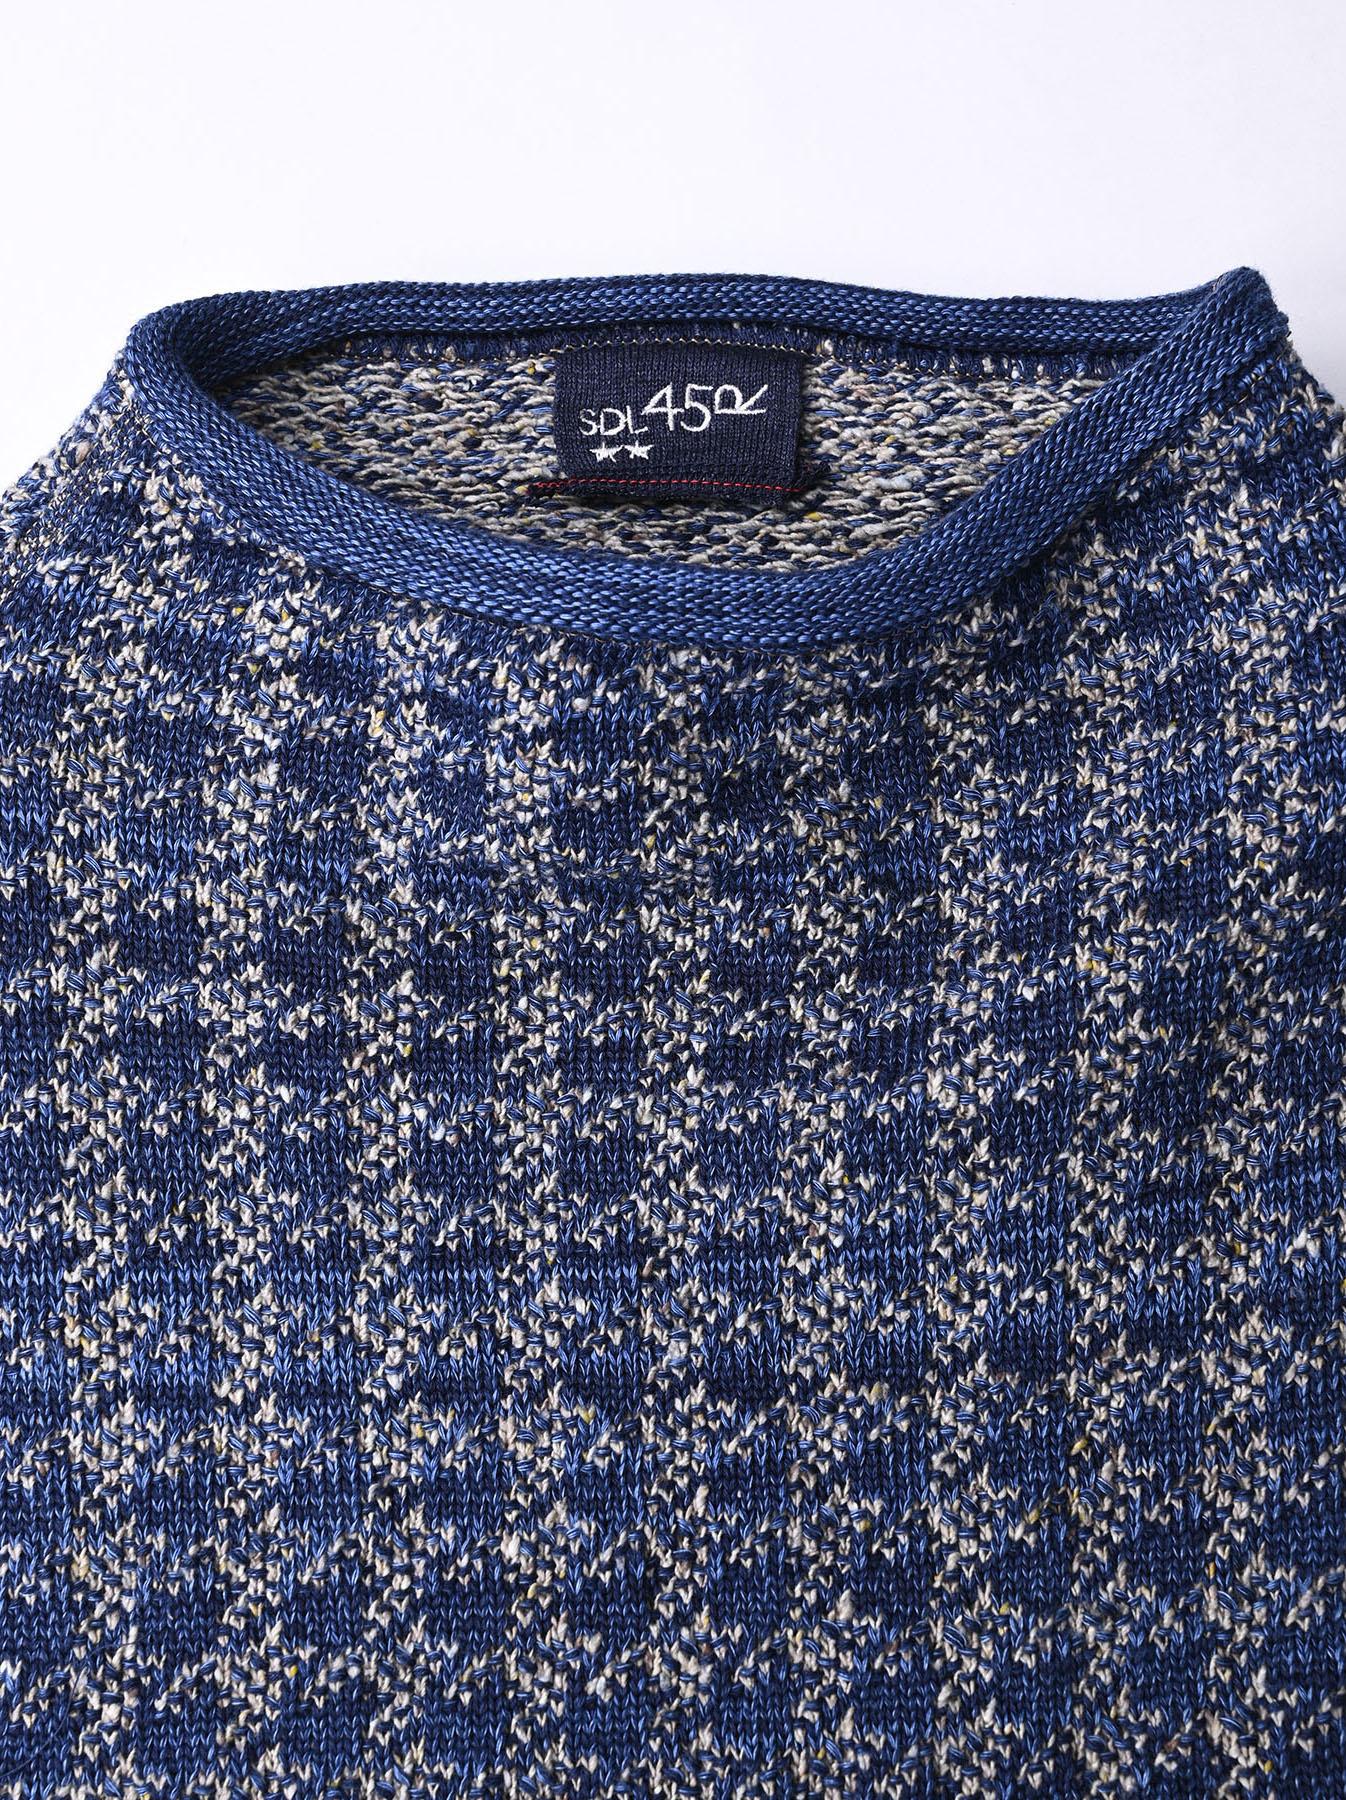 Indigo Knit Jacquard 908 Umahiko Sweater-10